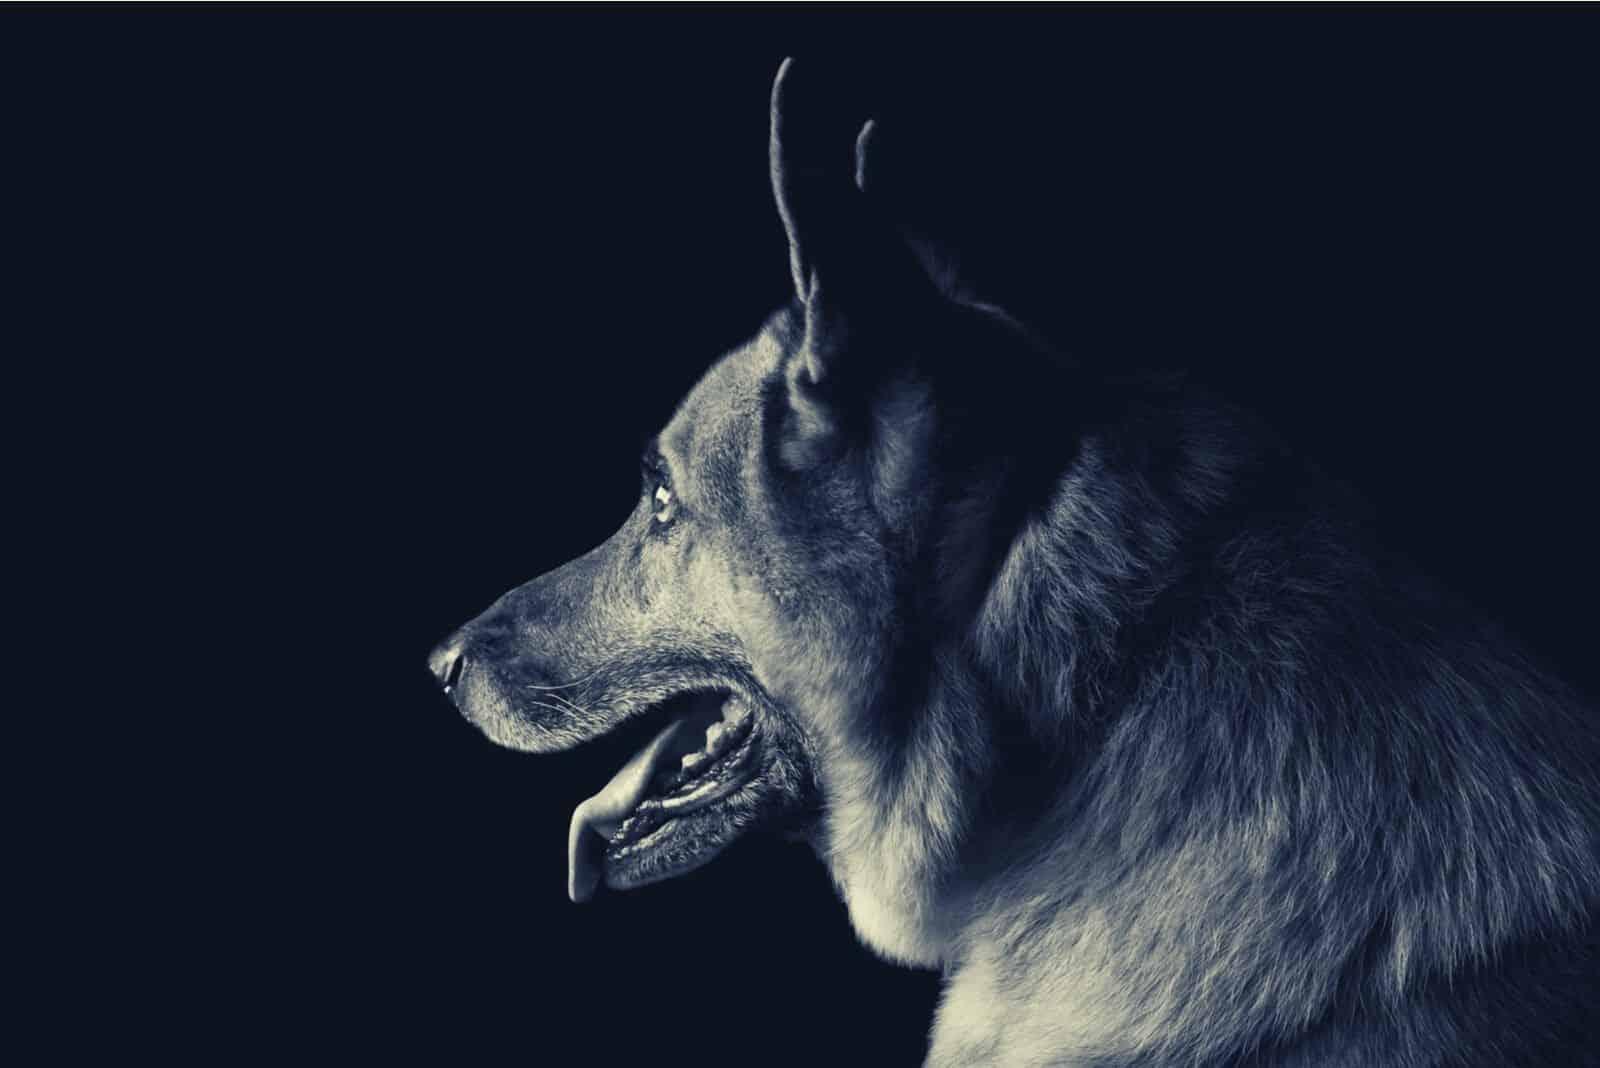 sideview of a german shepherd inside a dark room